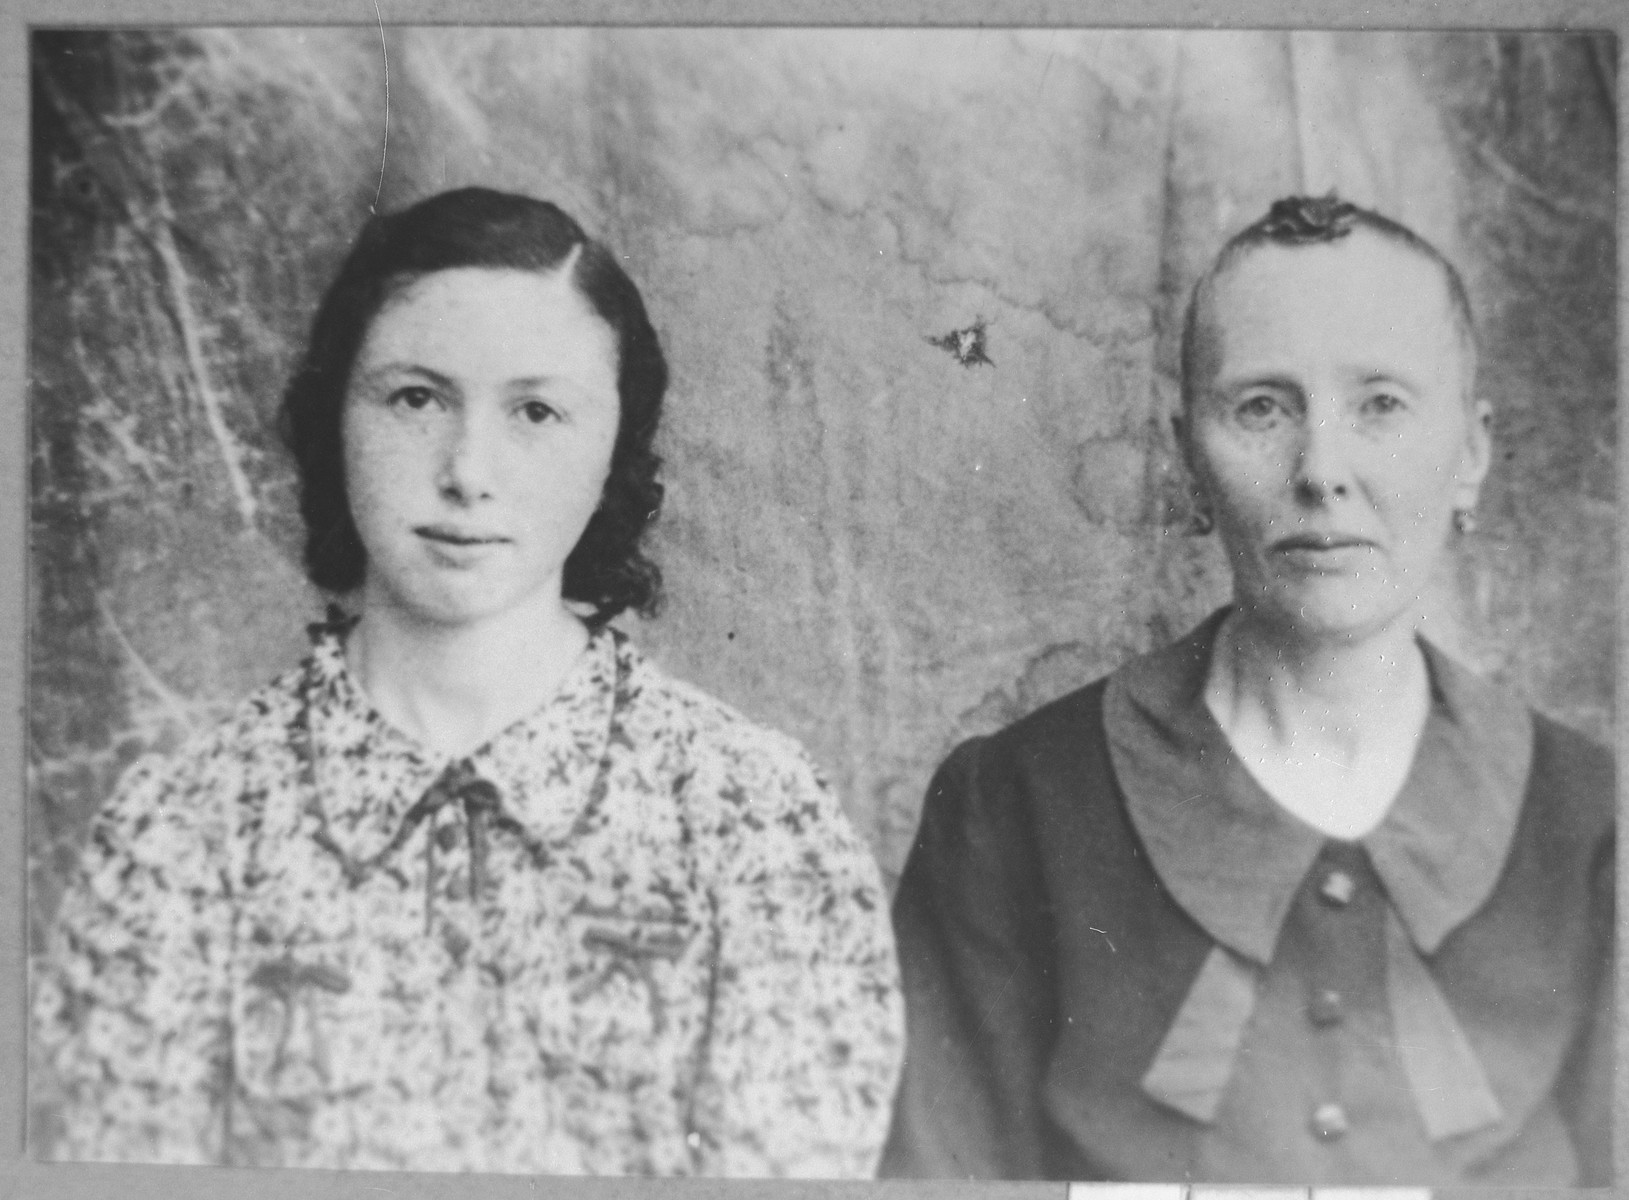 Portrait of Hana Navon, wife of Mushon Navon, and Perla Navon, daughter of Mushon Navon.  Perla was a student.  They lived at Mitrovatska 9-11.